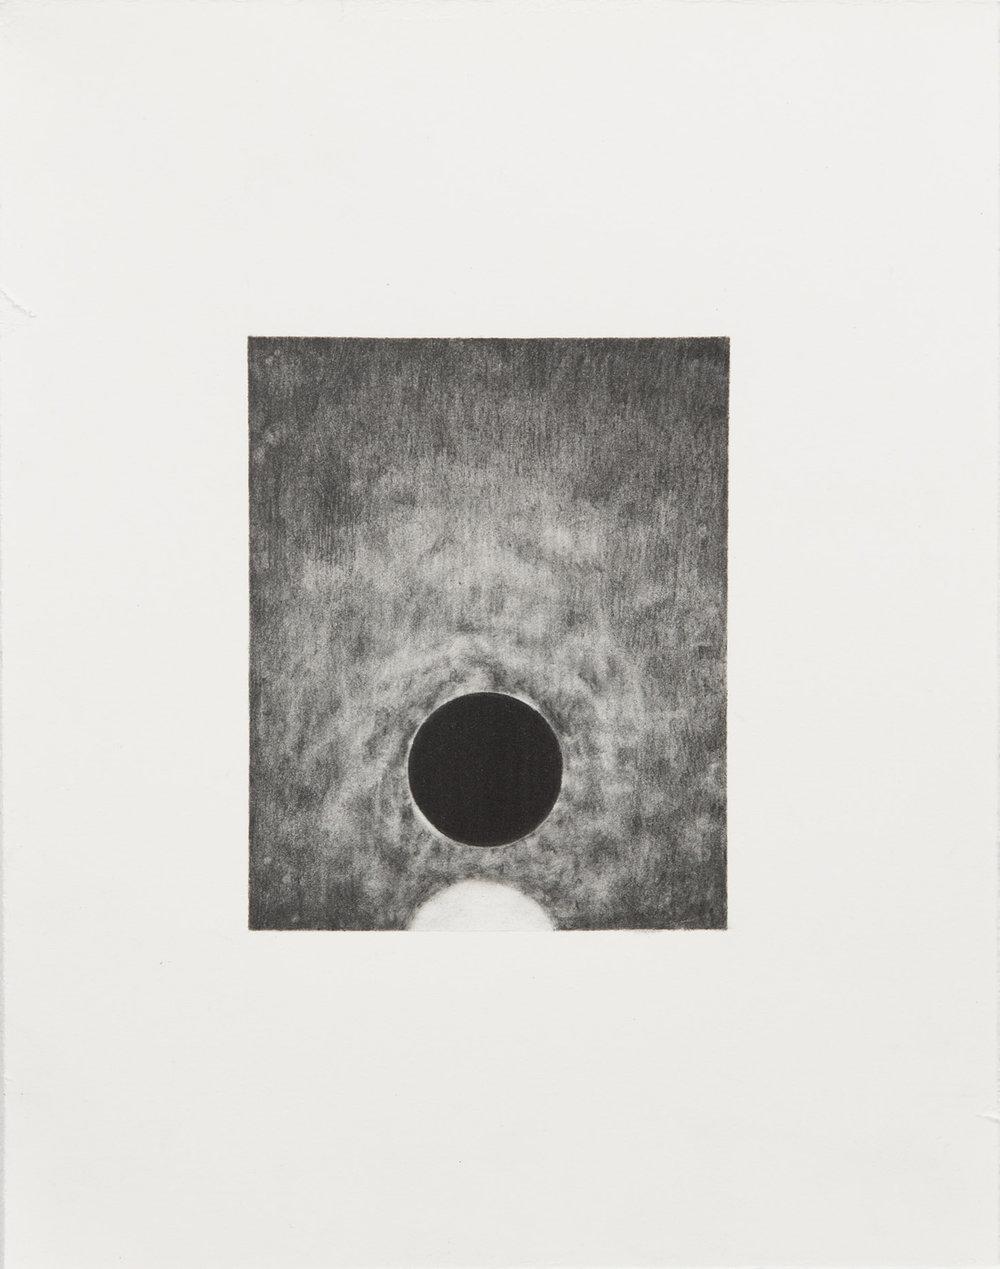 "Carl Trahan,  O   3,  2018, graphite on paper, 5"" x 4"" (12 x 10 cm)"